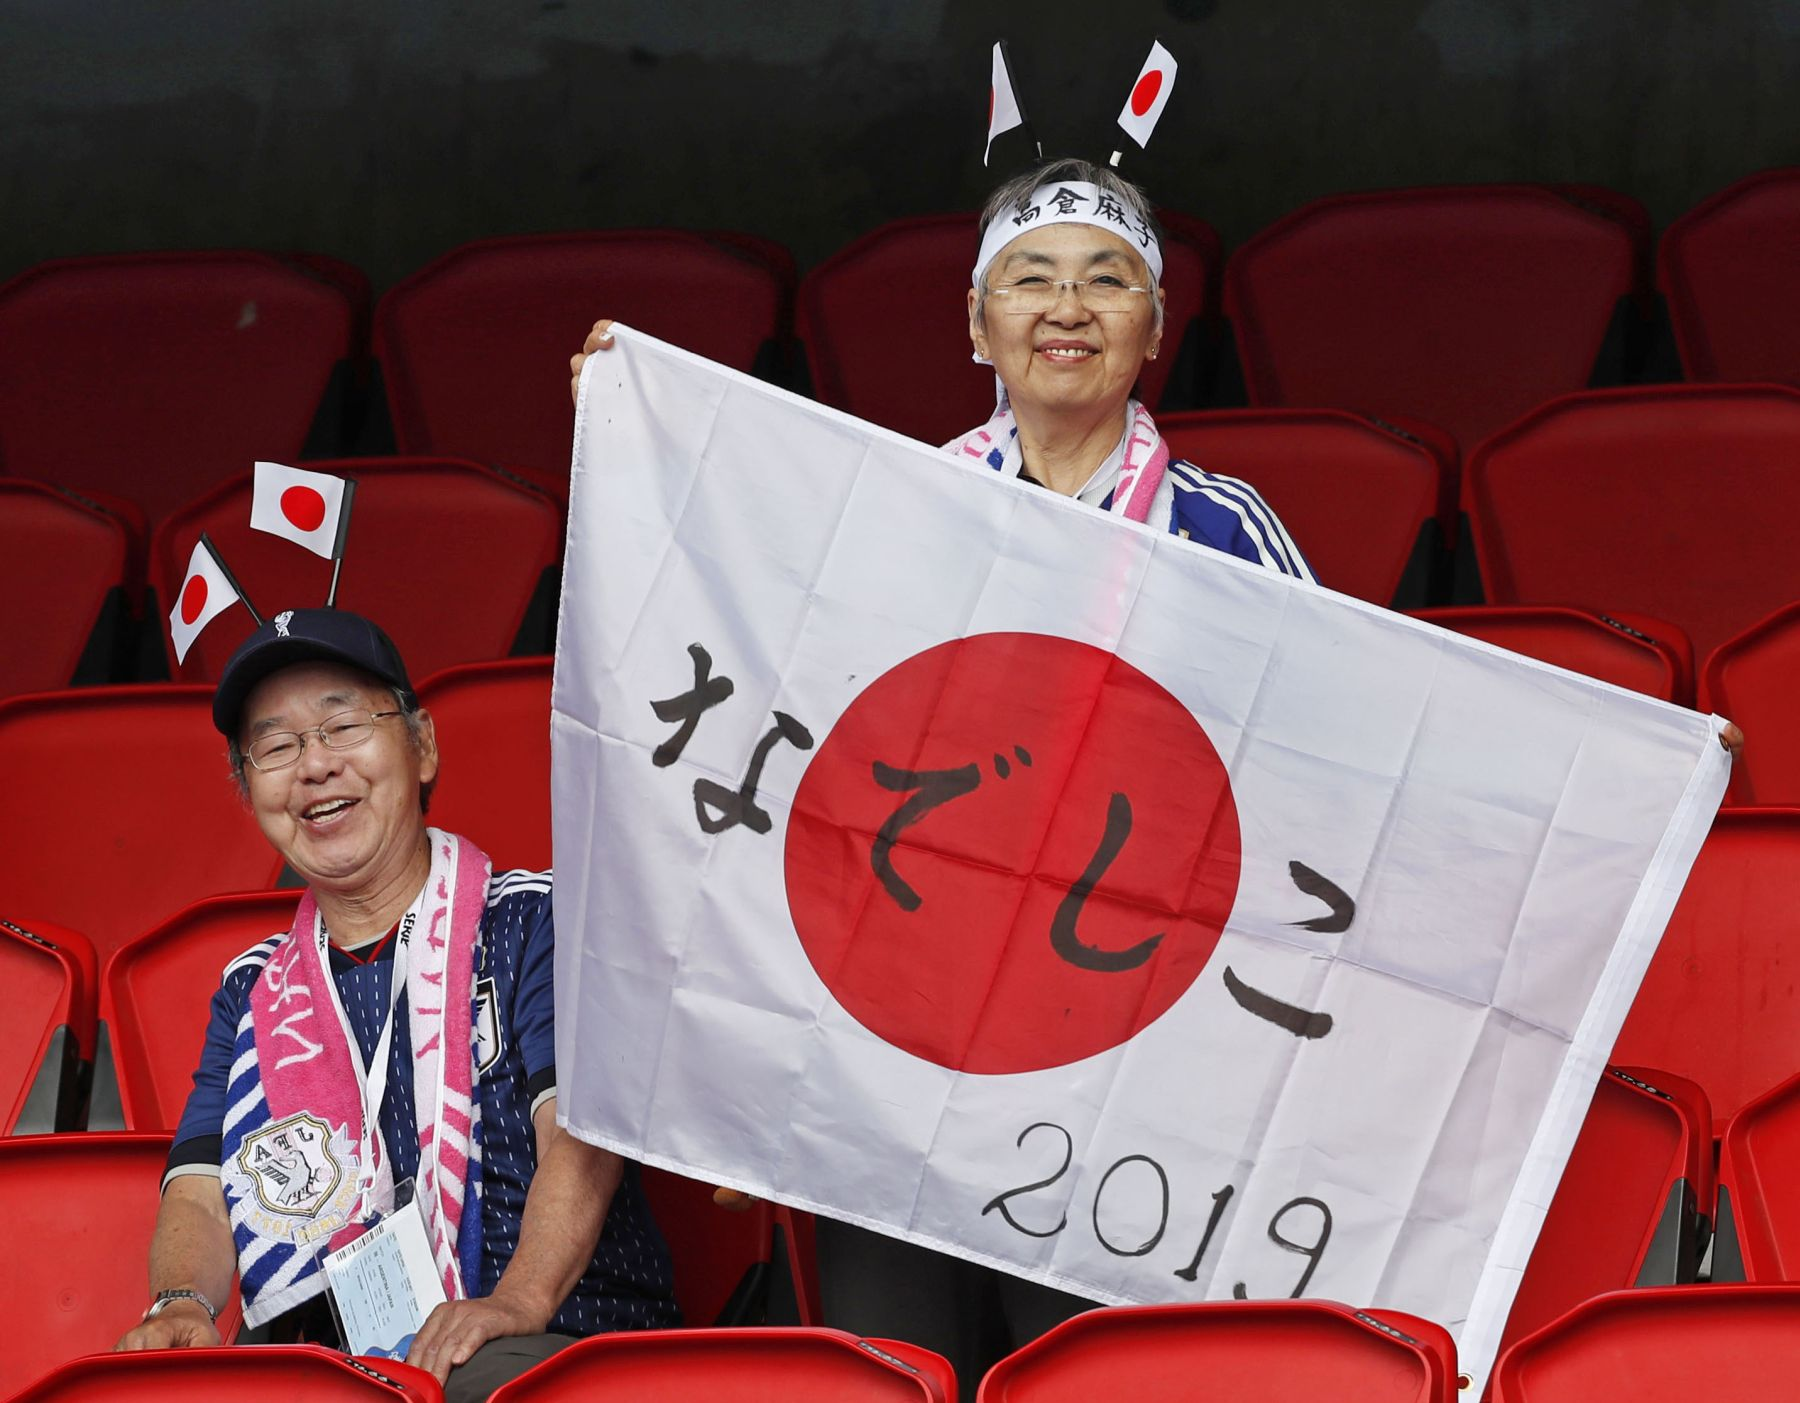 2019 FIFA Women's World Cup Japan vs Argentina 007